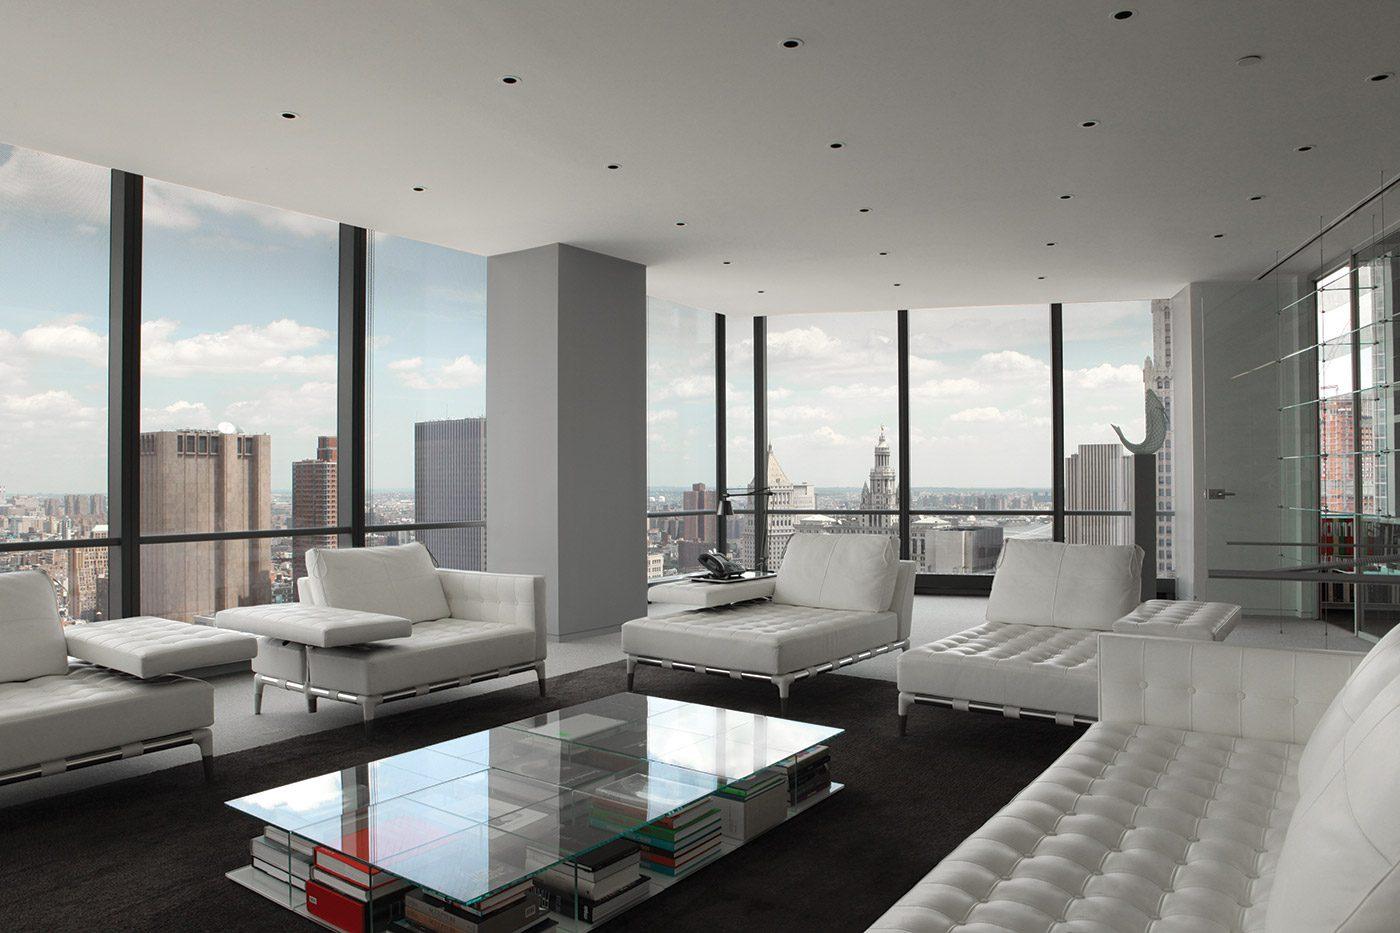 4 world trade centre - Glass reimagined - IGS Magazine - 3